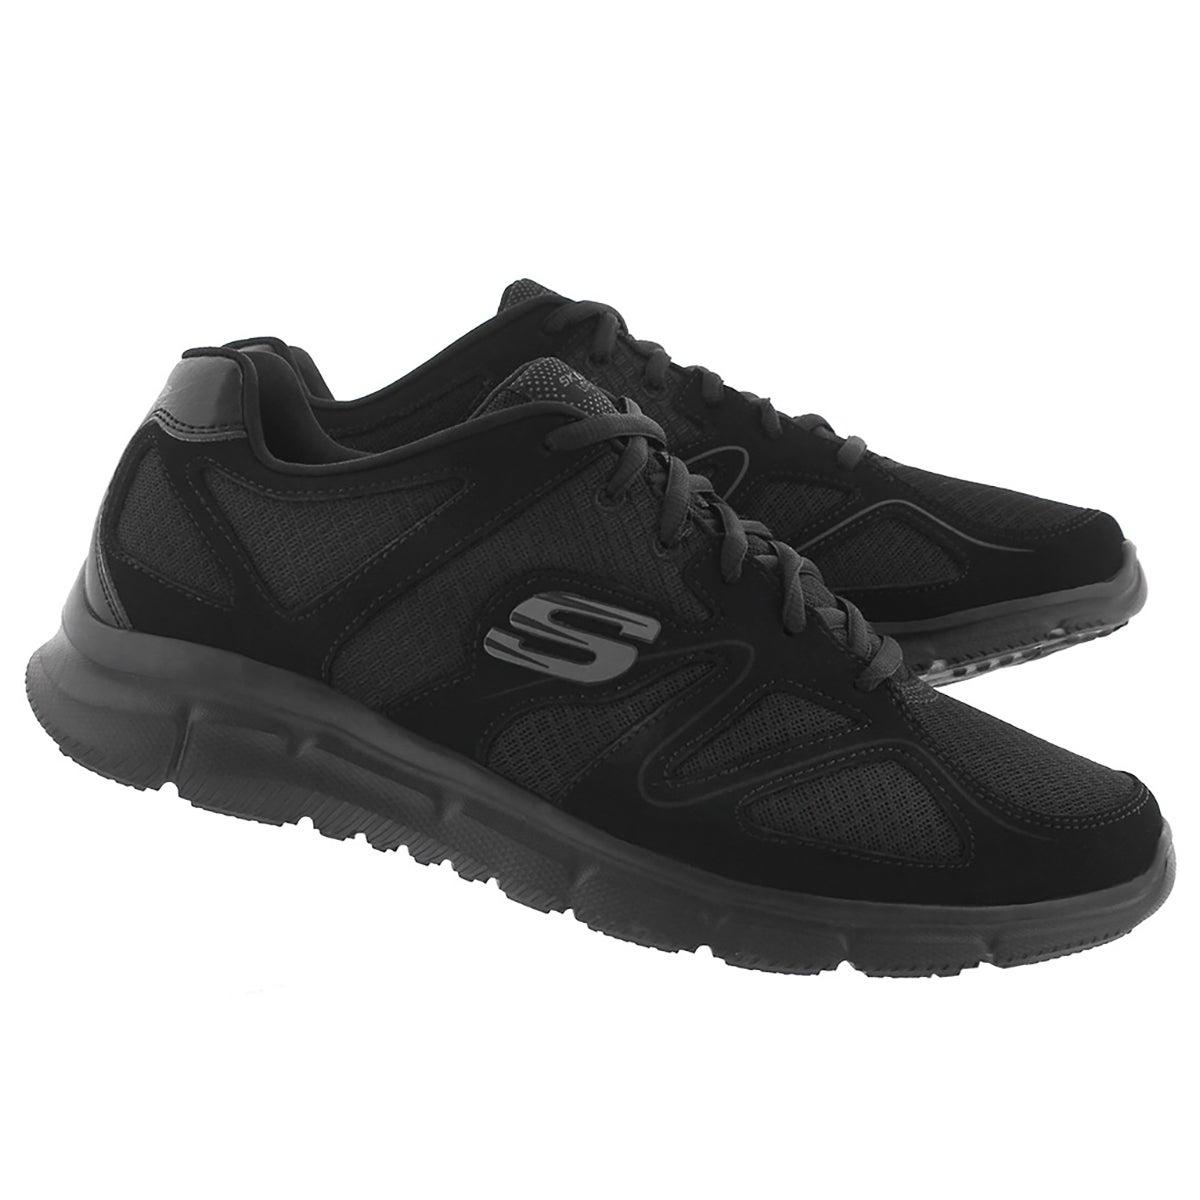 Mns VerseFlashPoint black running shoe